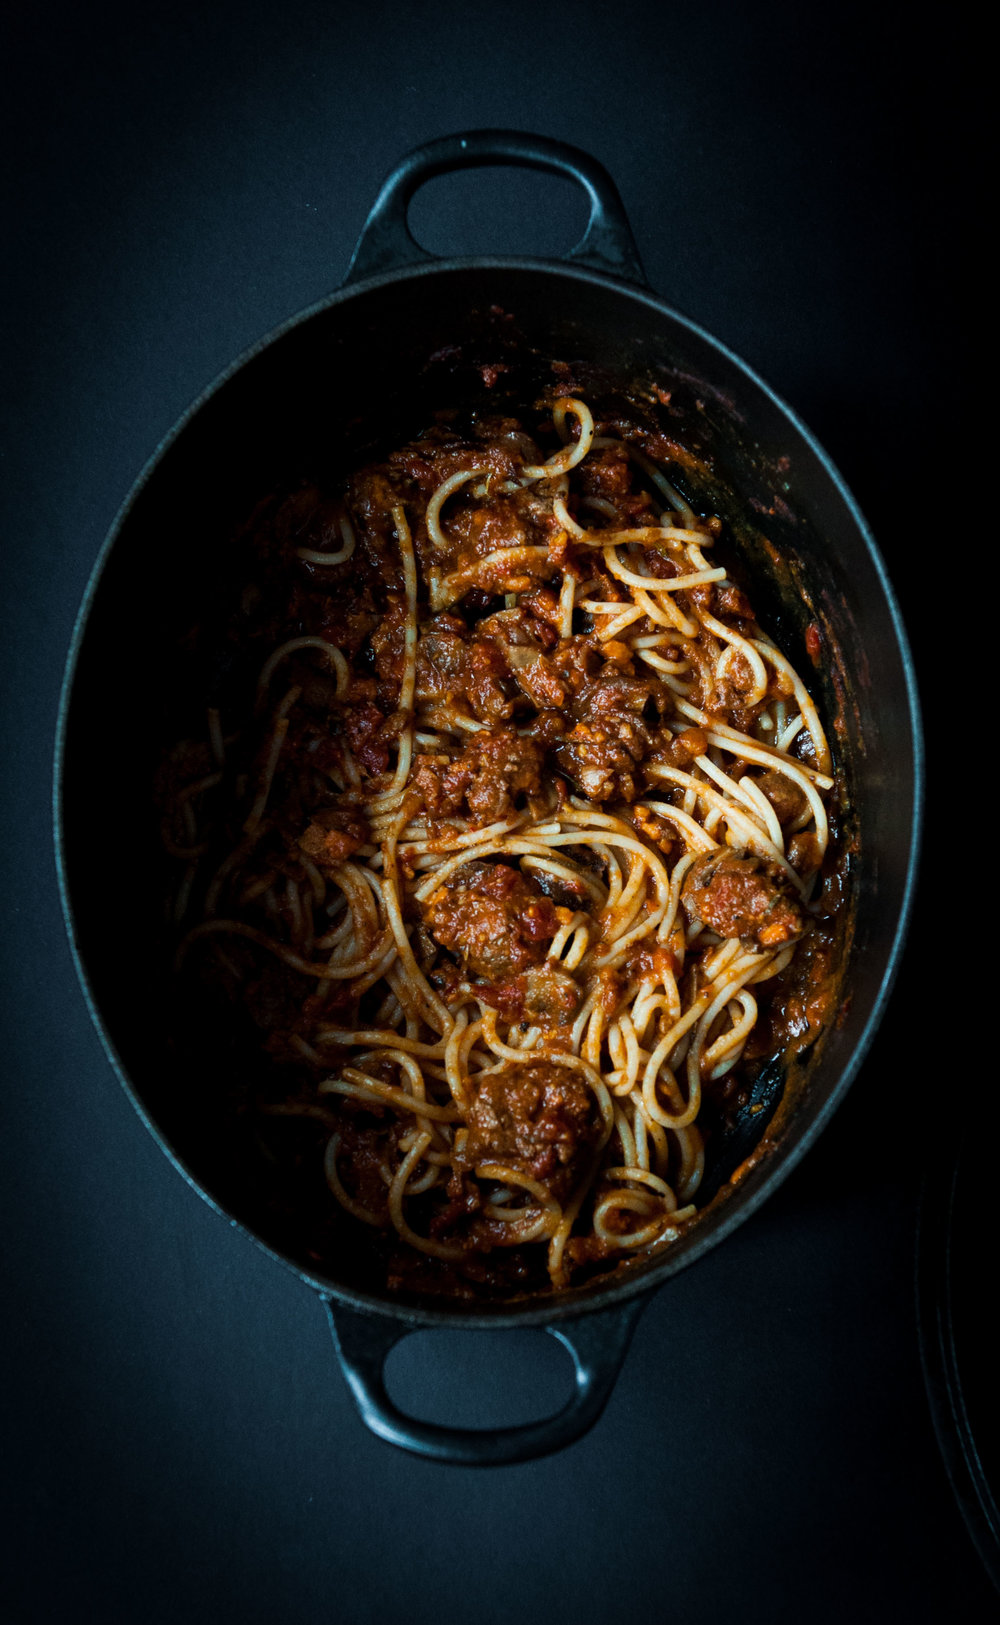 Lamb-Meat-Ragu-with-Spaghetti.jpg